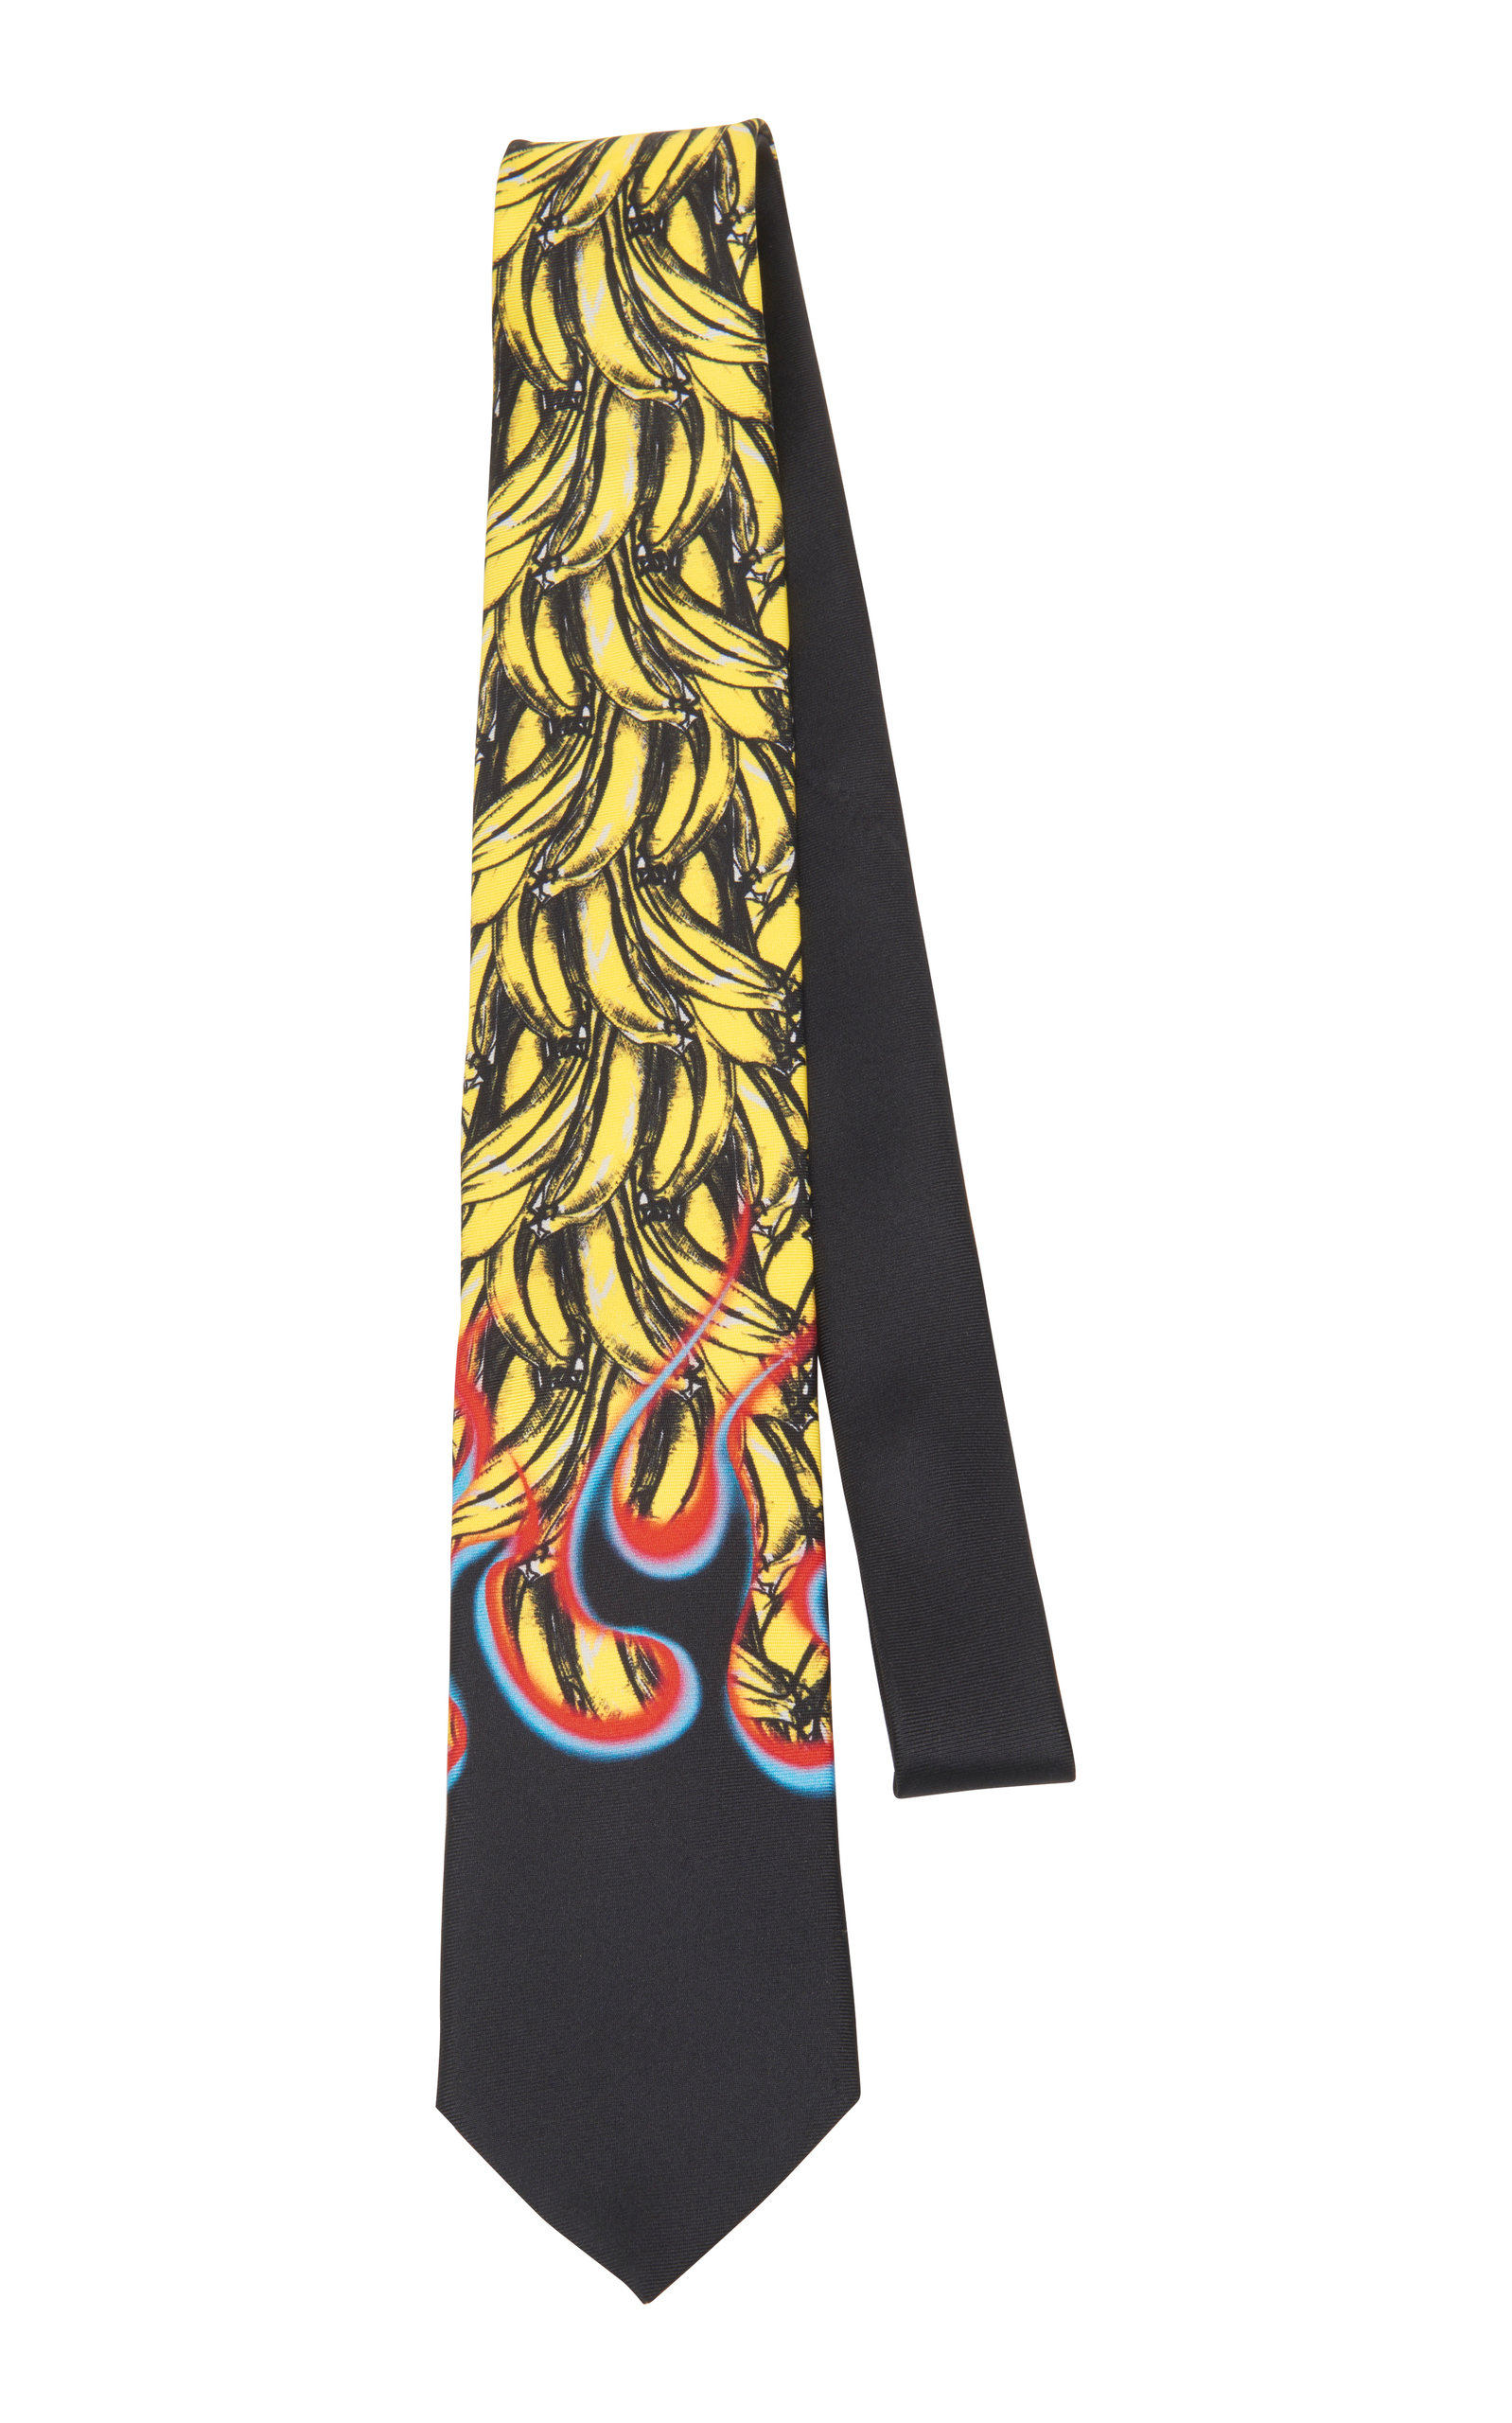 6e3e4a67a255 Banana And Flame Silk Tie by Prada | Moda Operandi